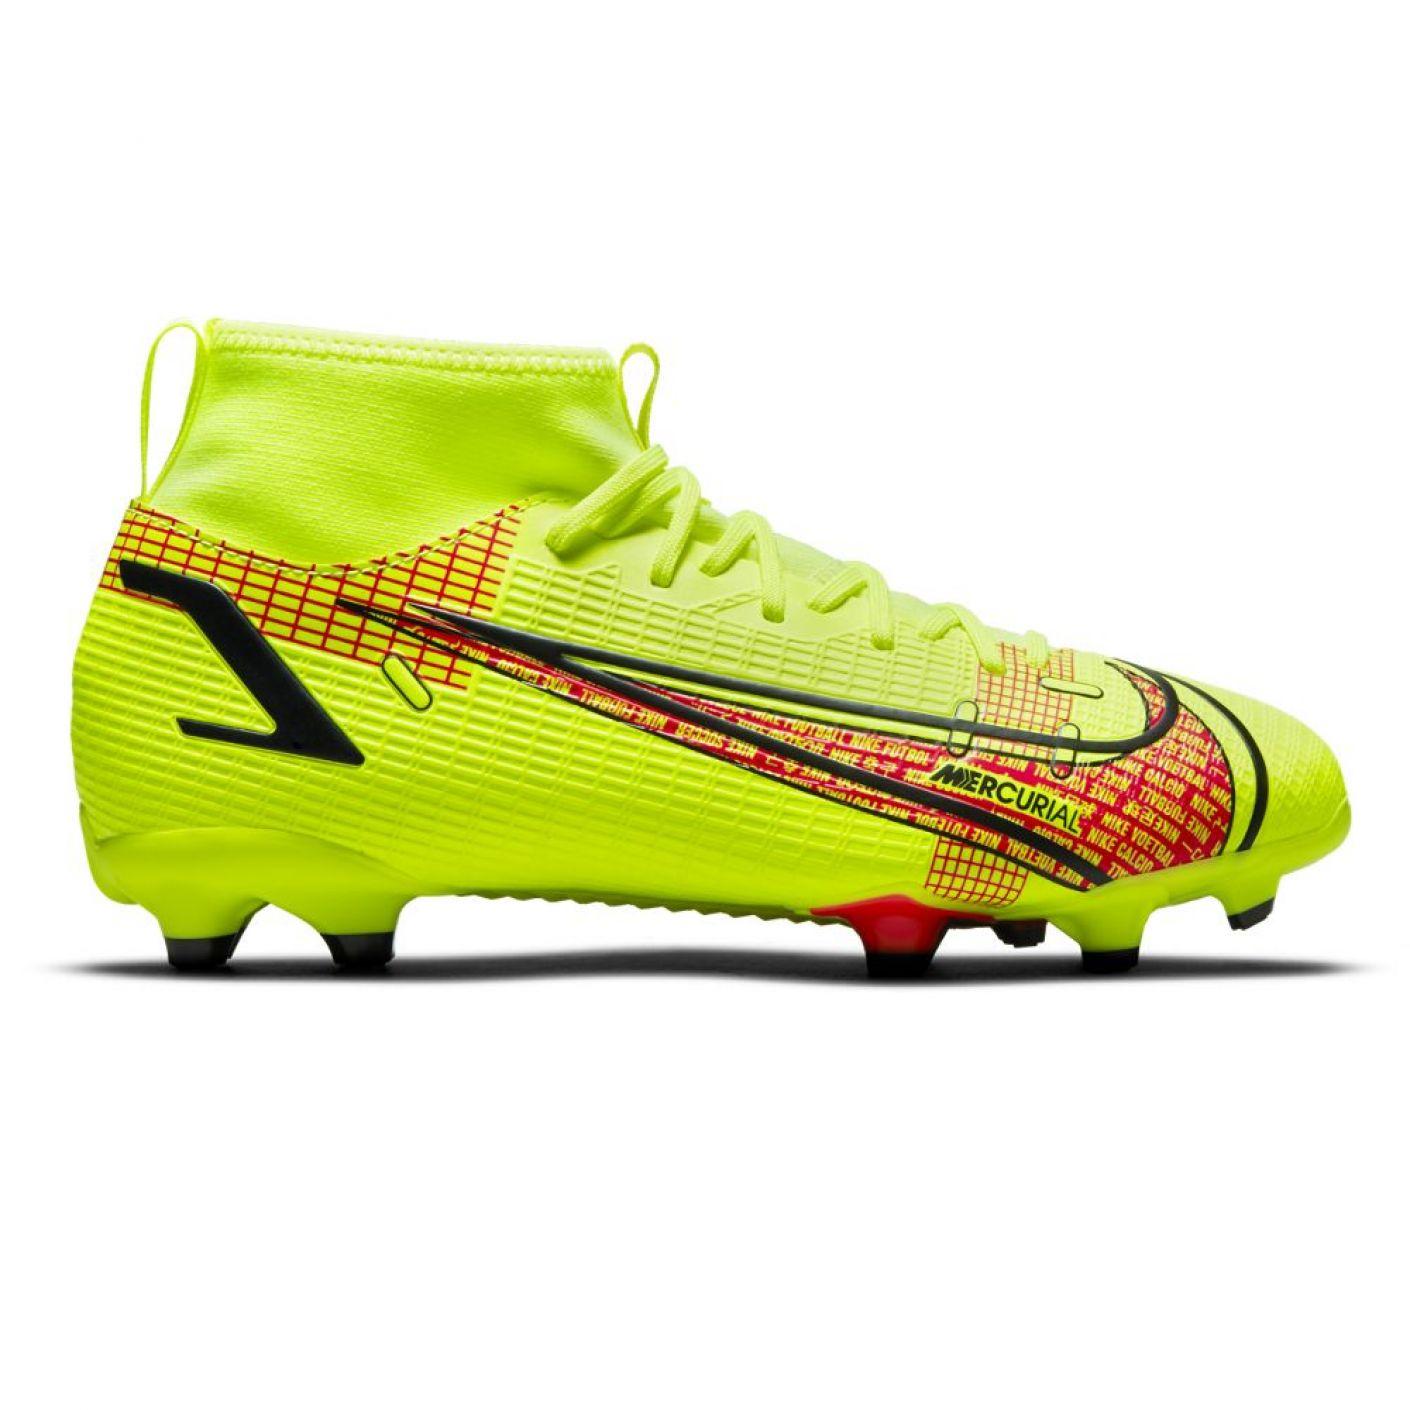 Nike Mercurial Superfly 8 Academy Gras / Kunstgras Voetbalschoenen (MG) Kids Wit Zwart Rood